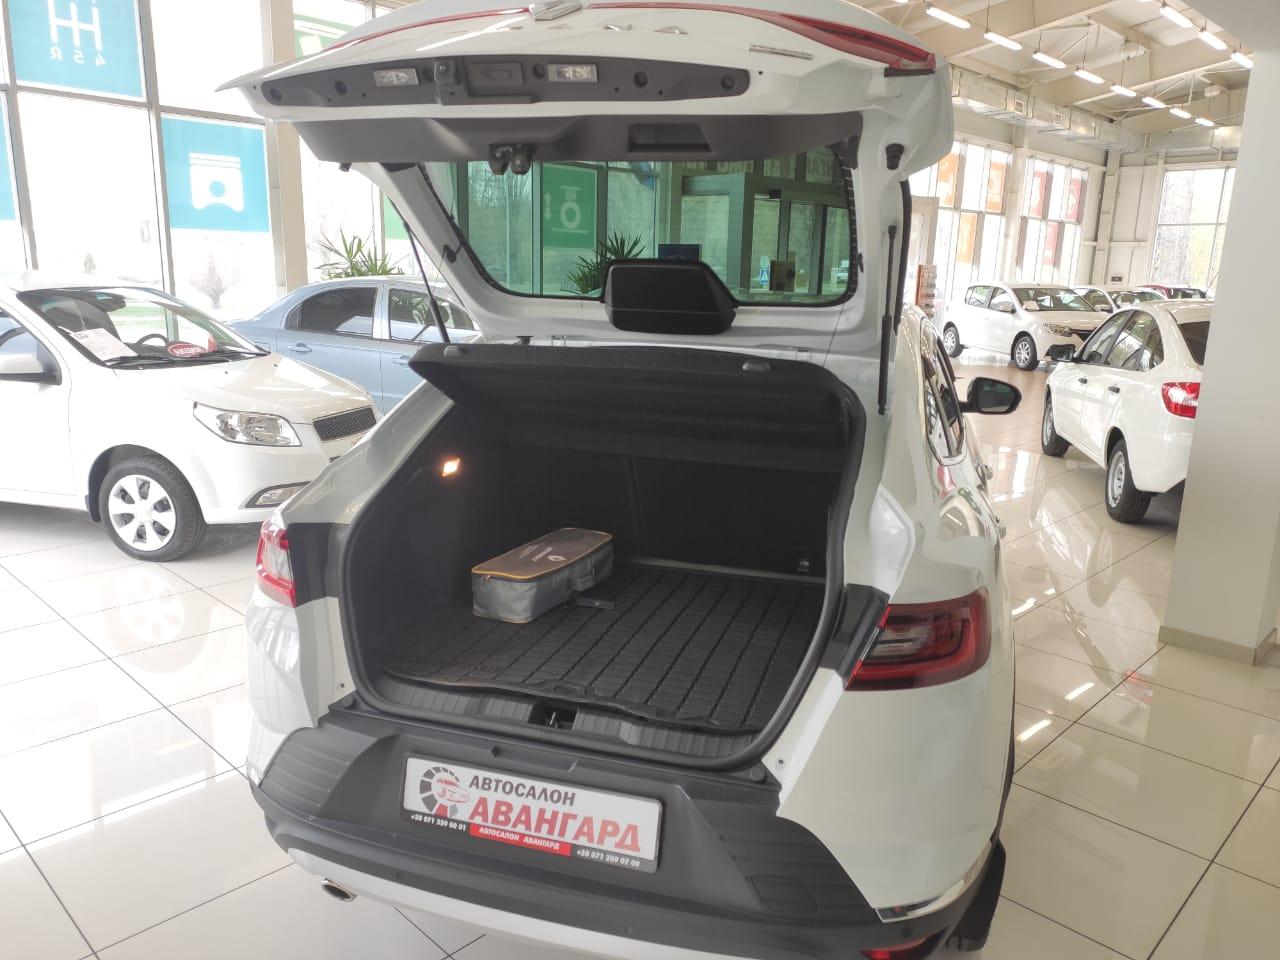 Renault ARKANA TCE 150 4×4 CVT X-Tronic, Pulse, Белый, 2021